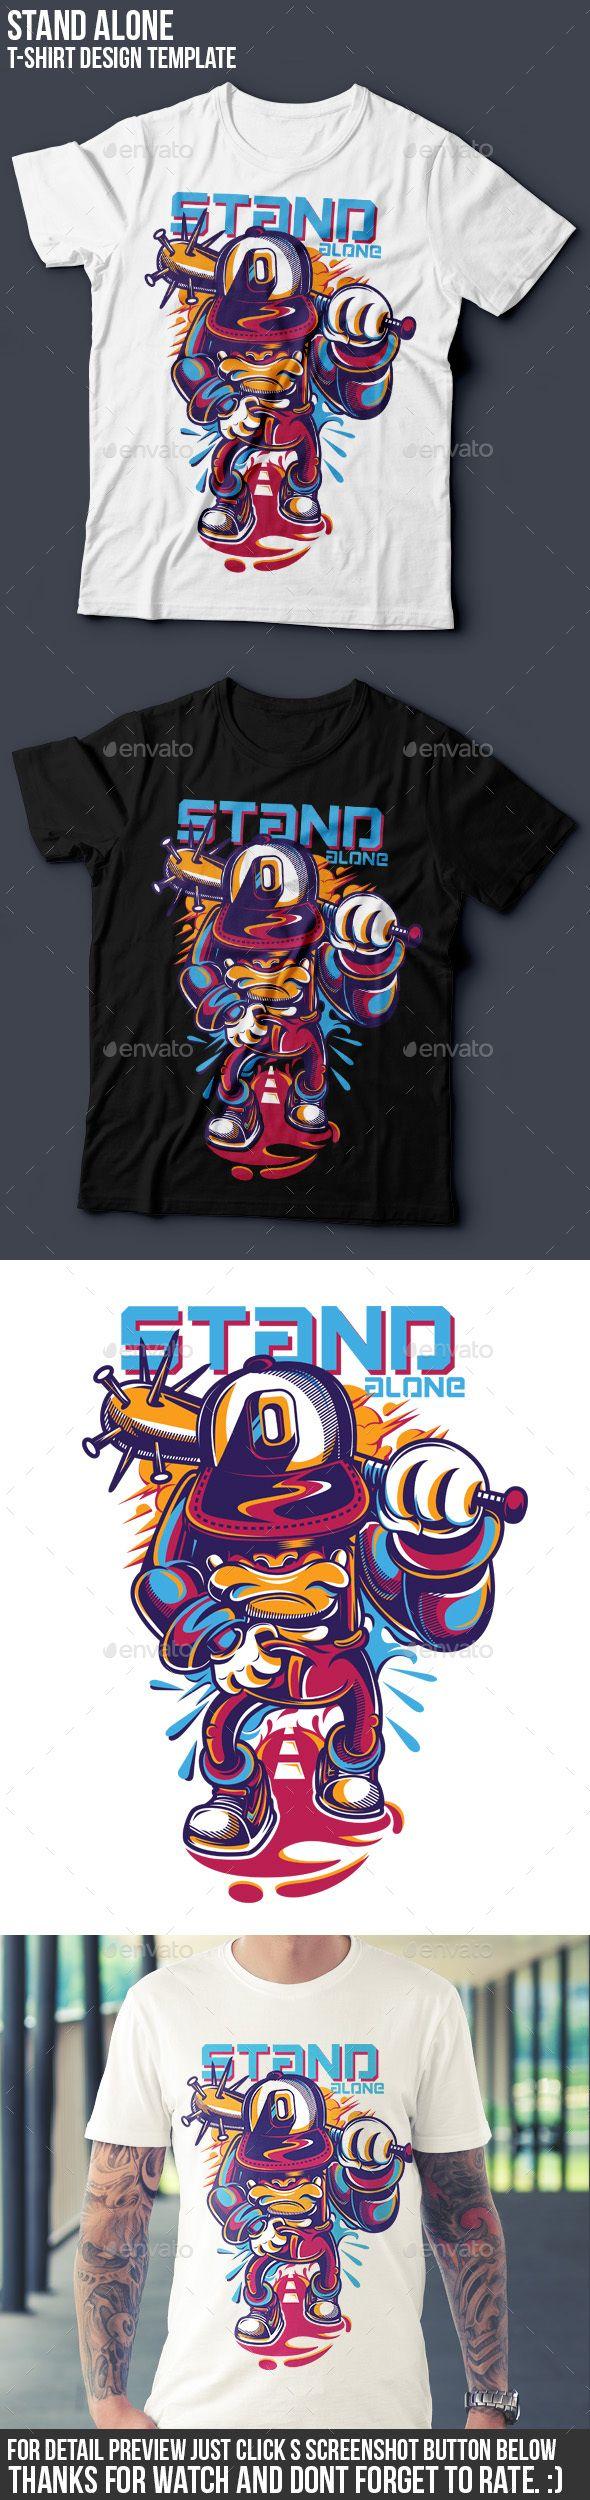 Shirt jack design template - Stand Alone T Shirt Design